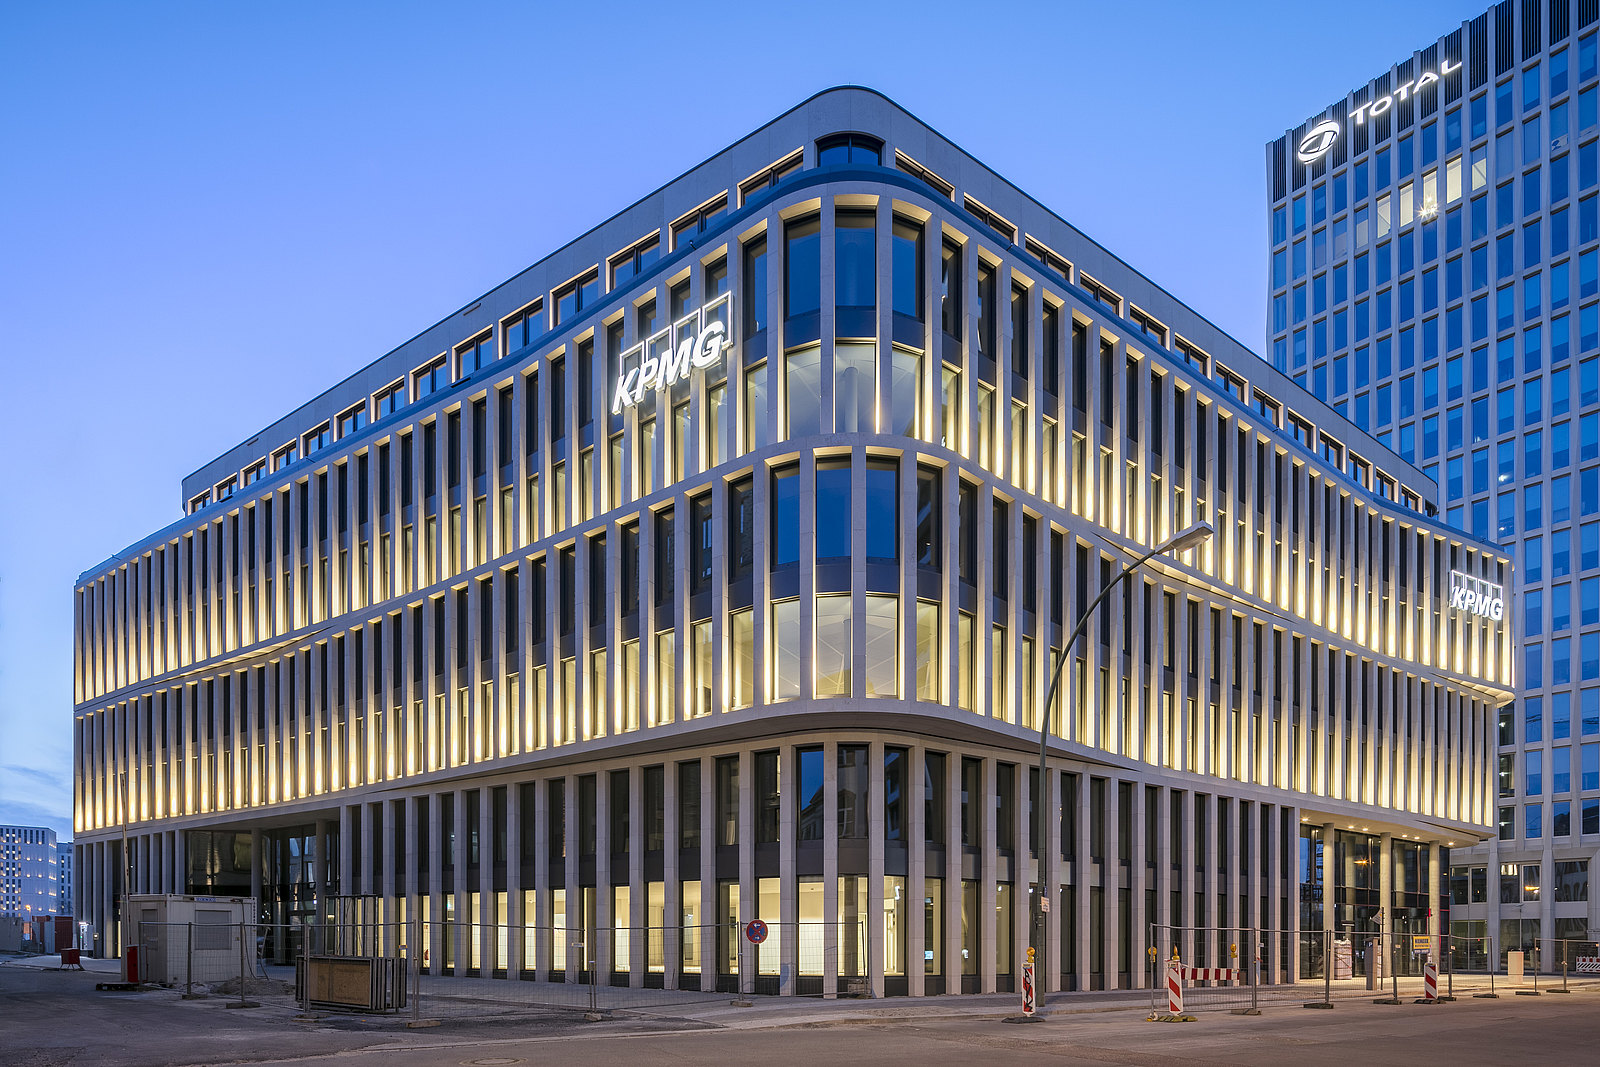 Kpmg Building